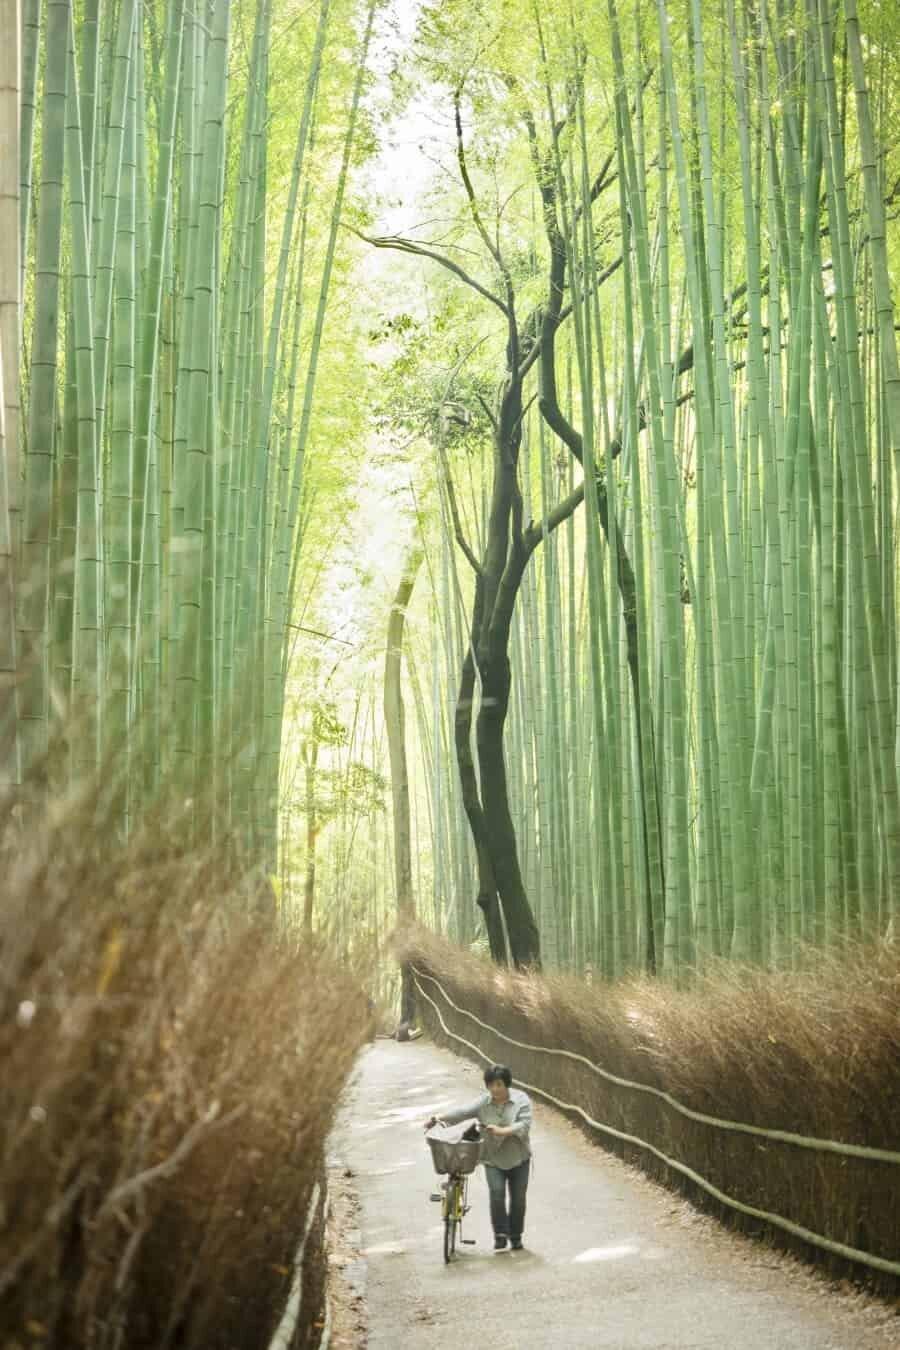 Arashiyama Bamboo Grove, Kyoto Japan - Improve your travel photography by The Wandering Lens